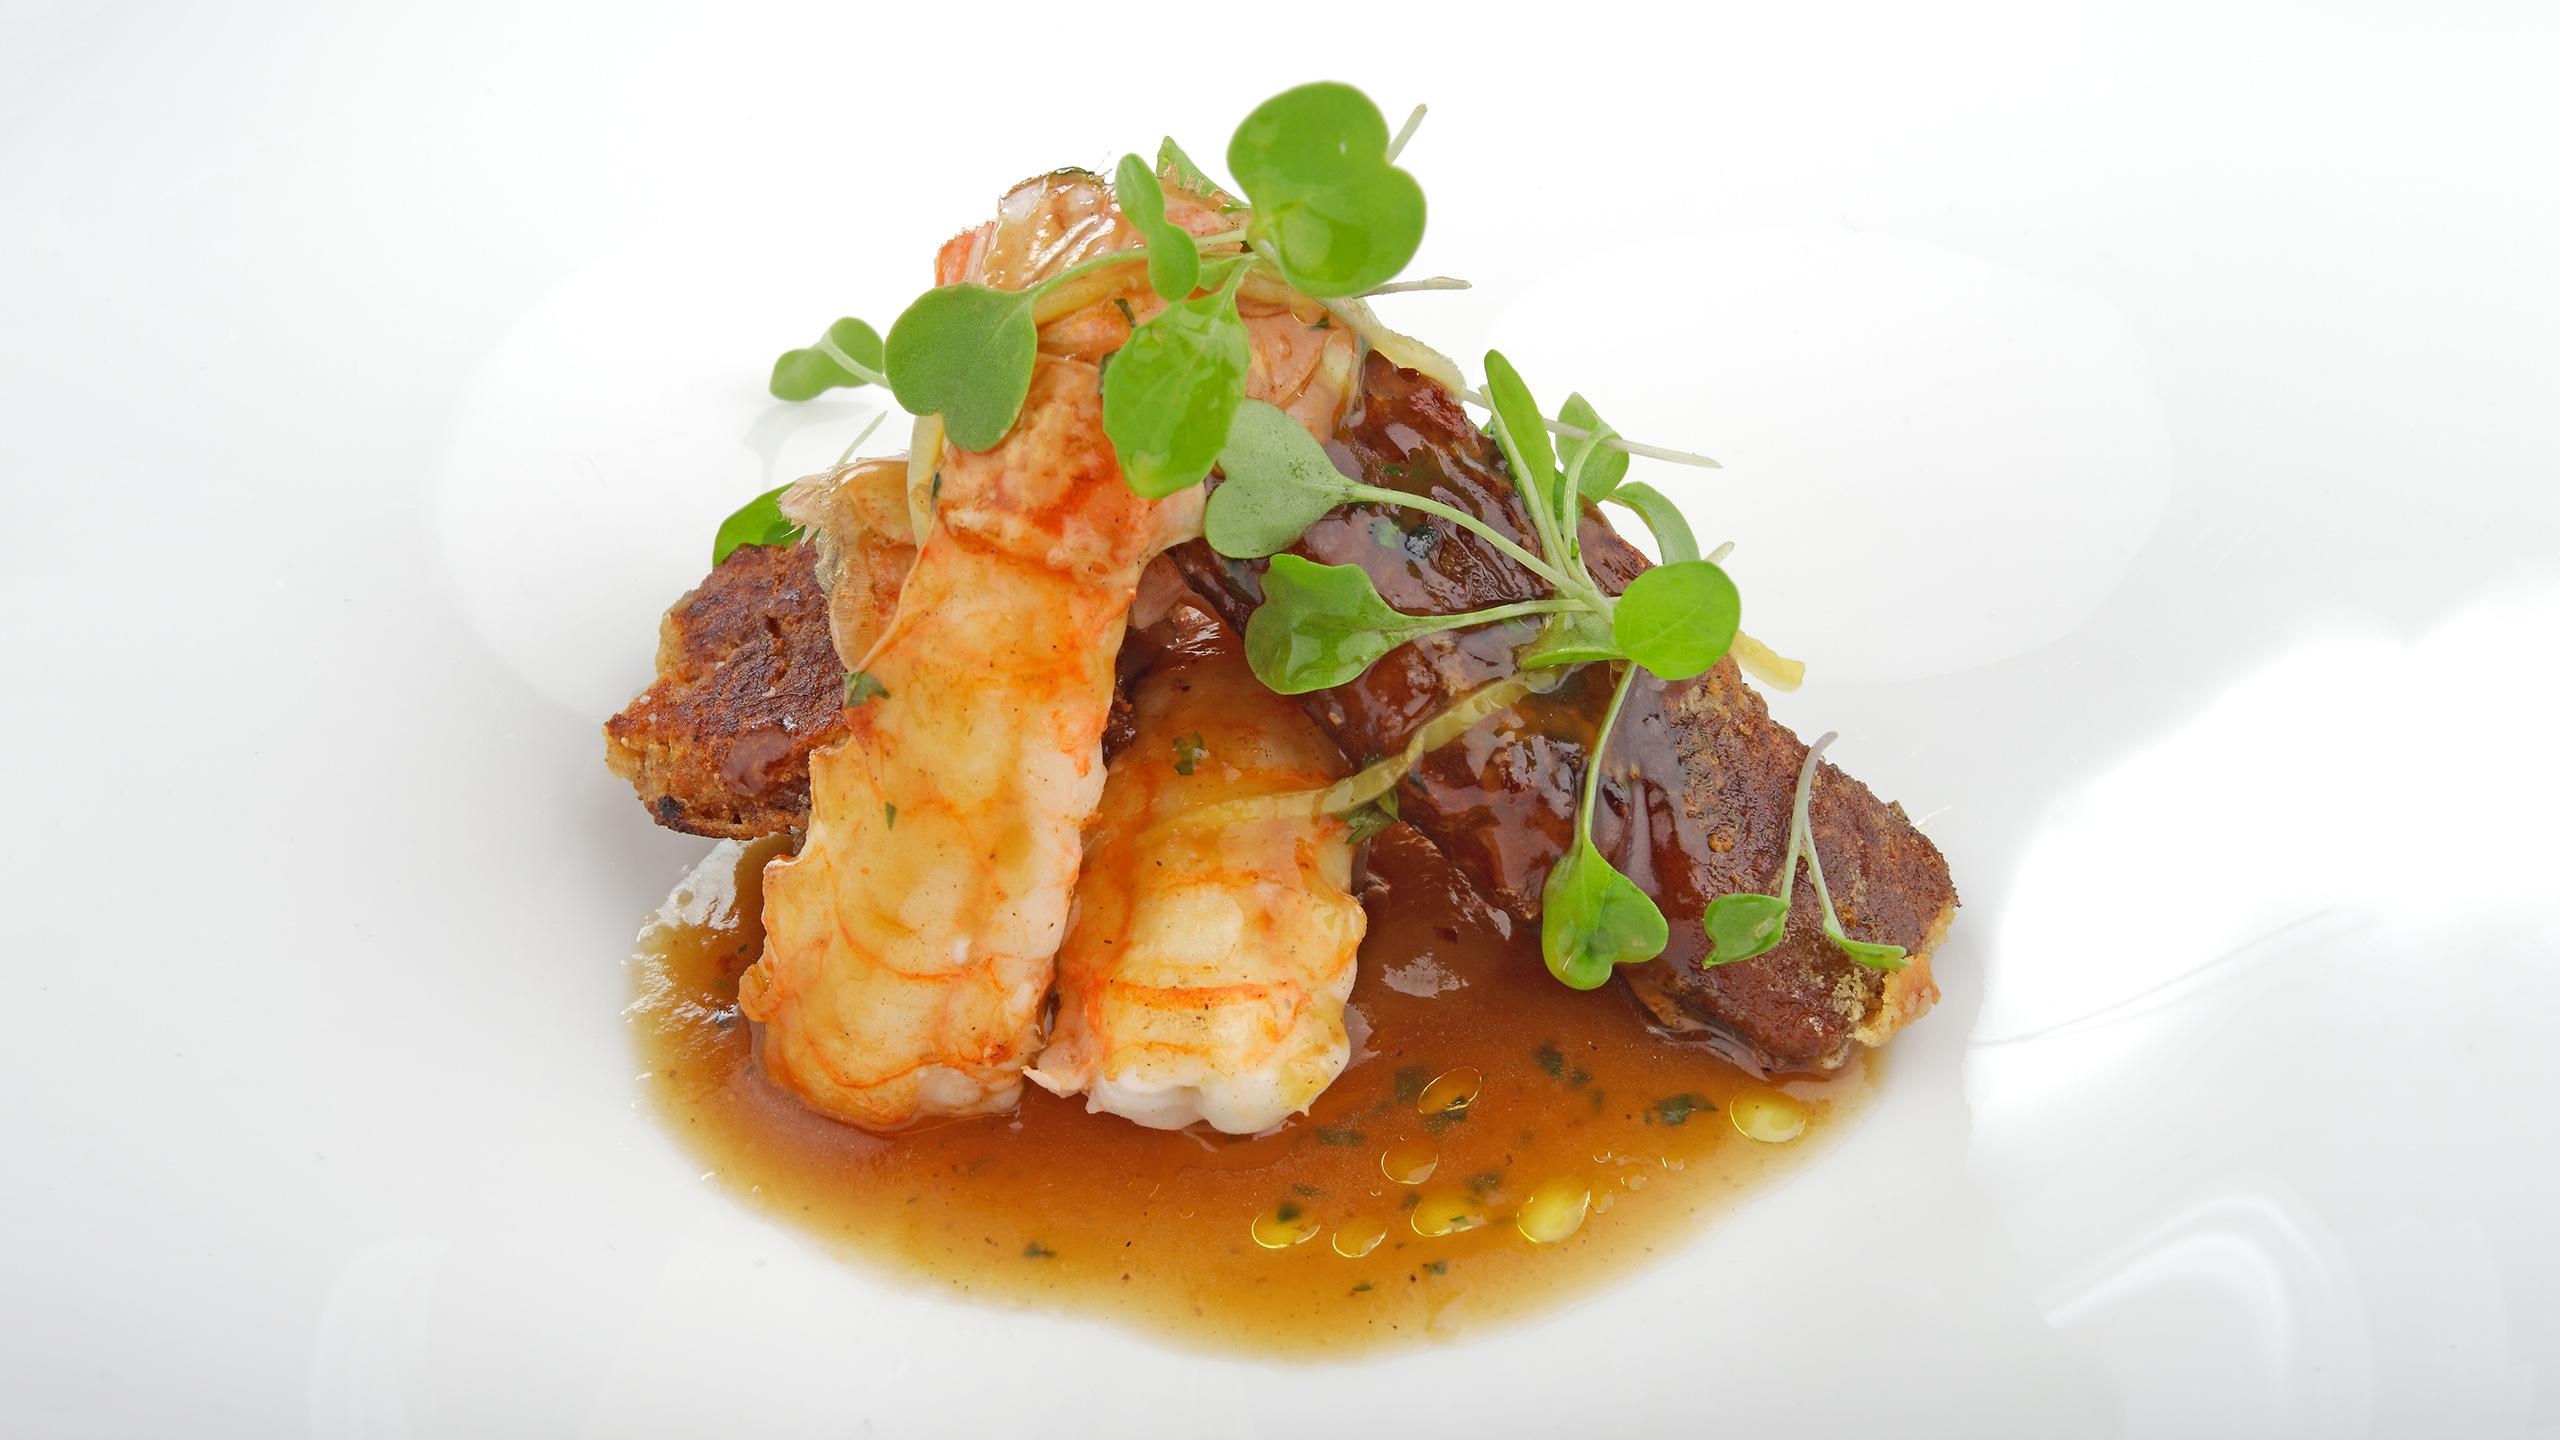 gastronomia 64 tafona